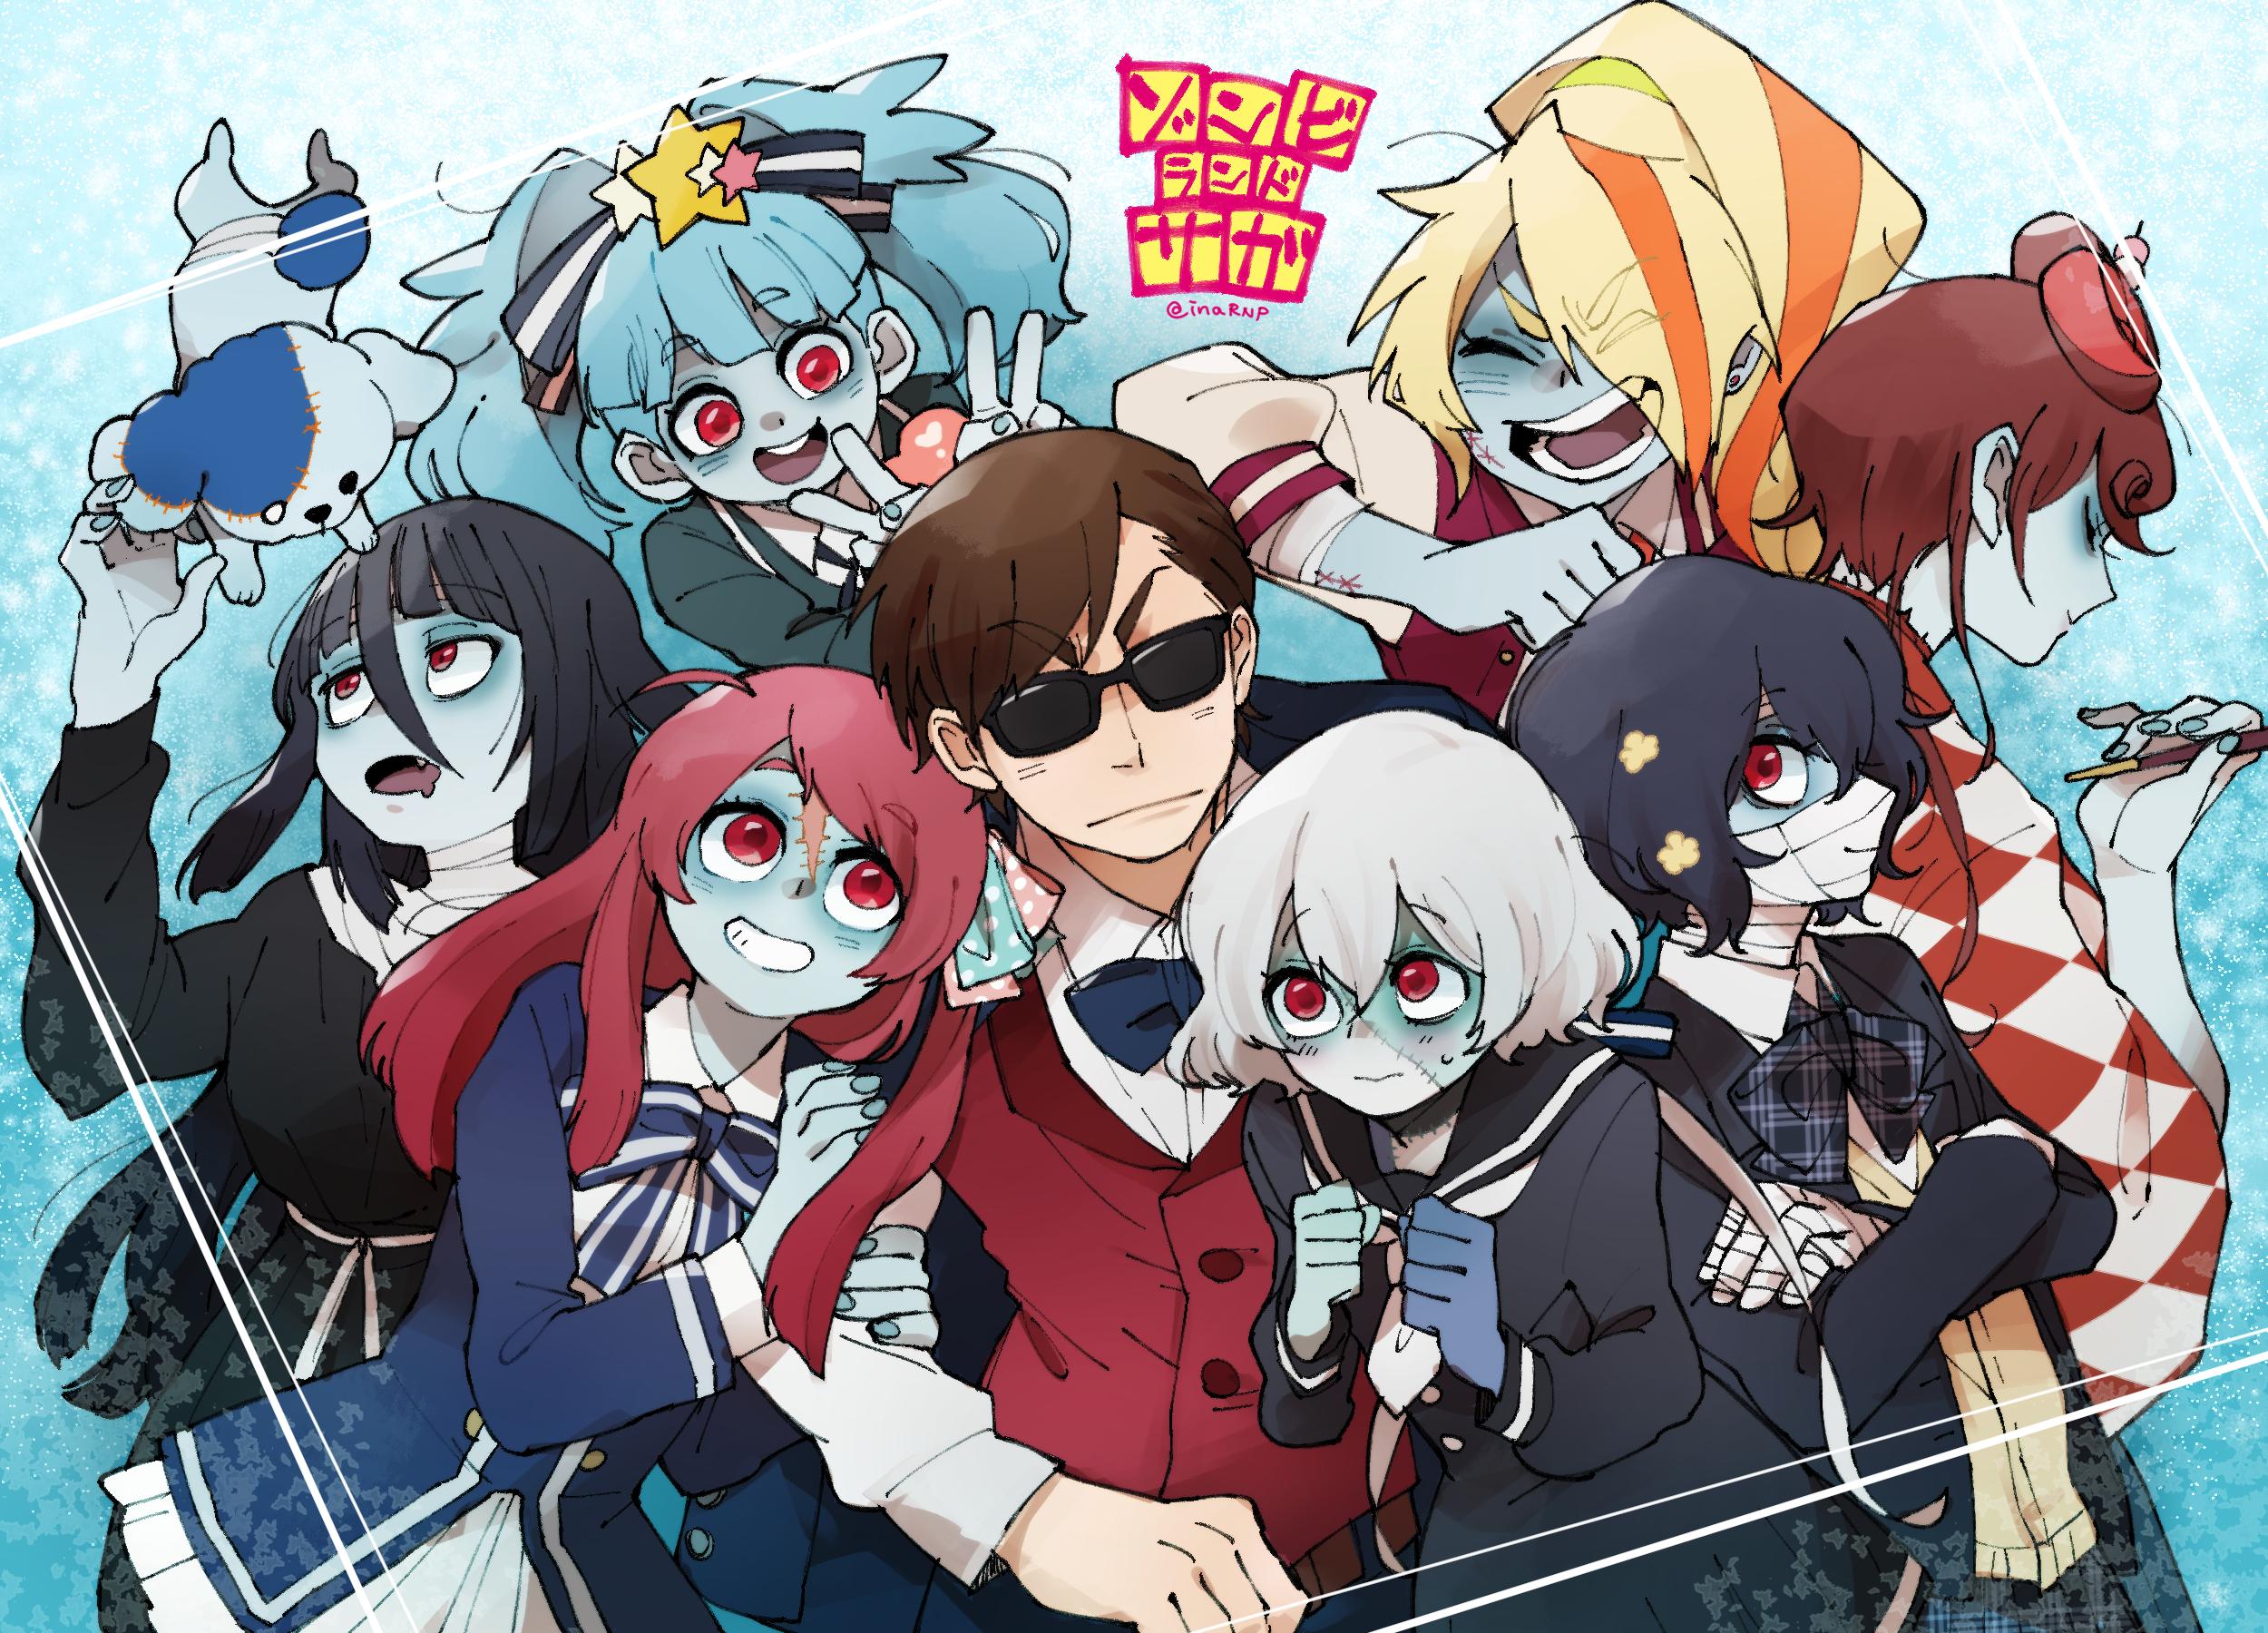 Zombieland Saga Anime Girls Zombie 0 Tae Yamada Zombie 1 Sakura Minamoto Zombie 2 Saki Nikaidou Zomb 2500x1800